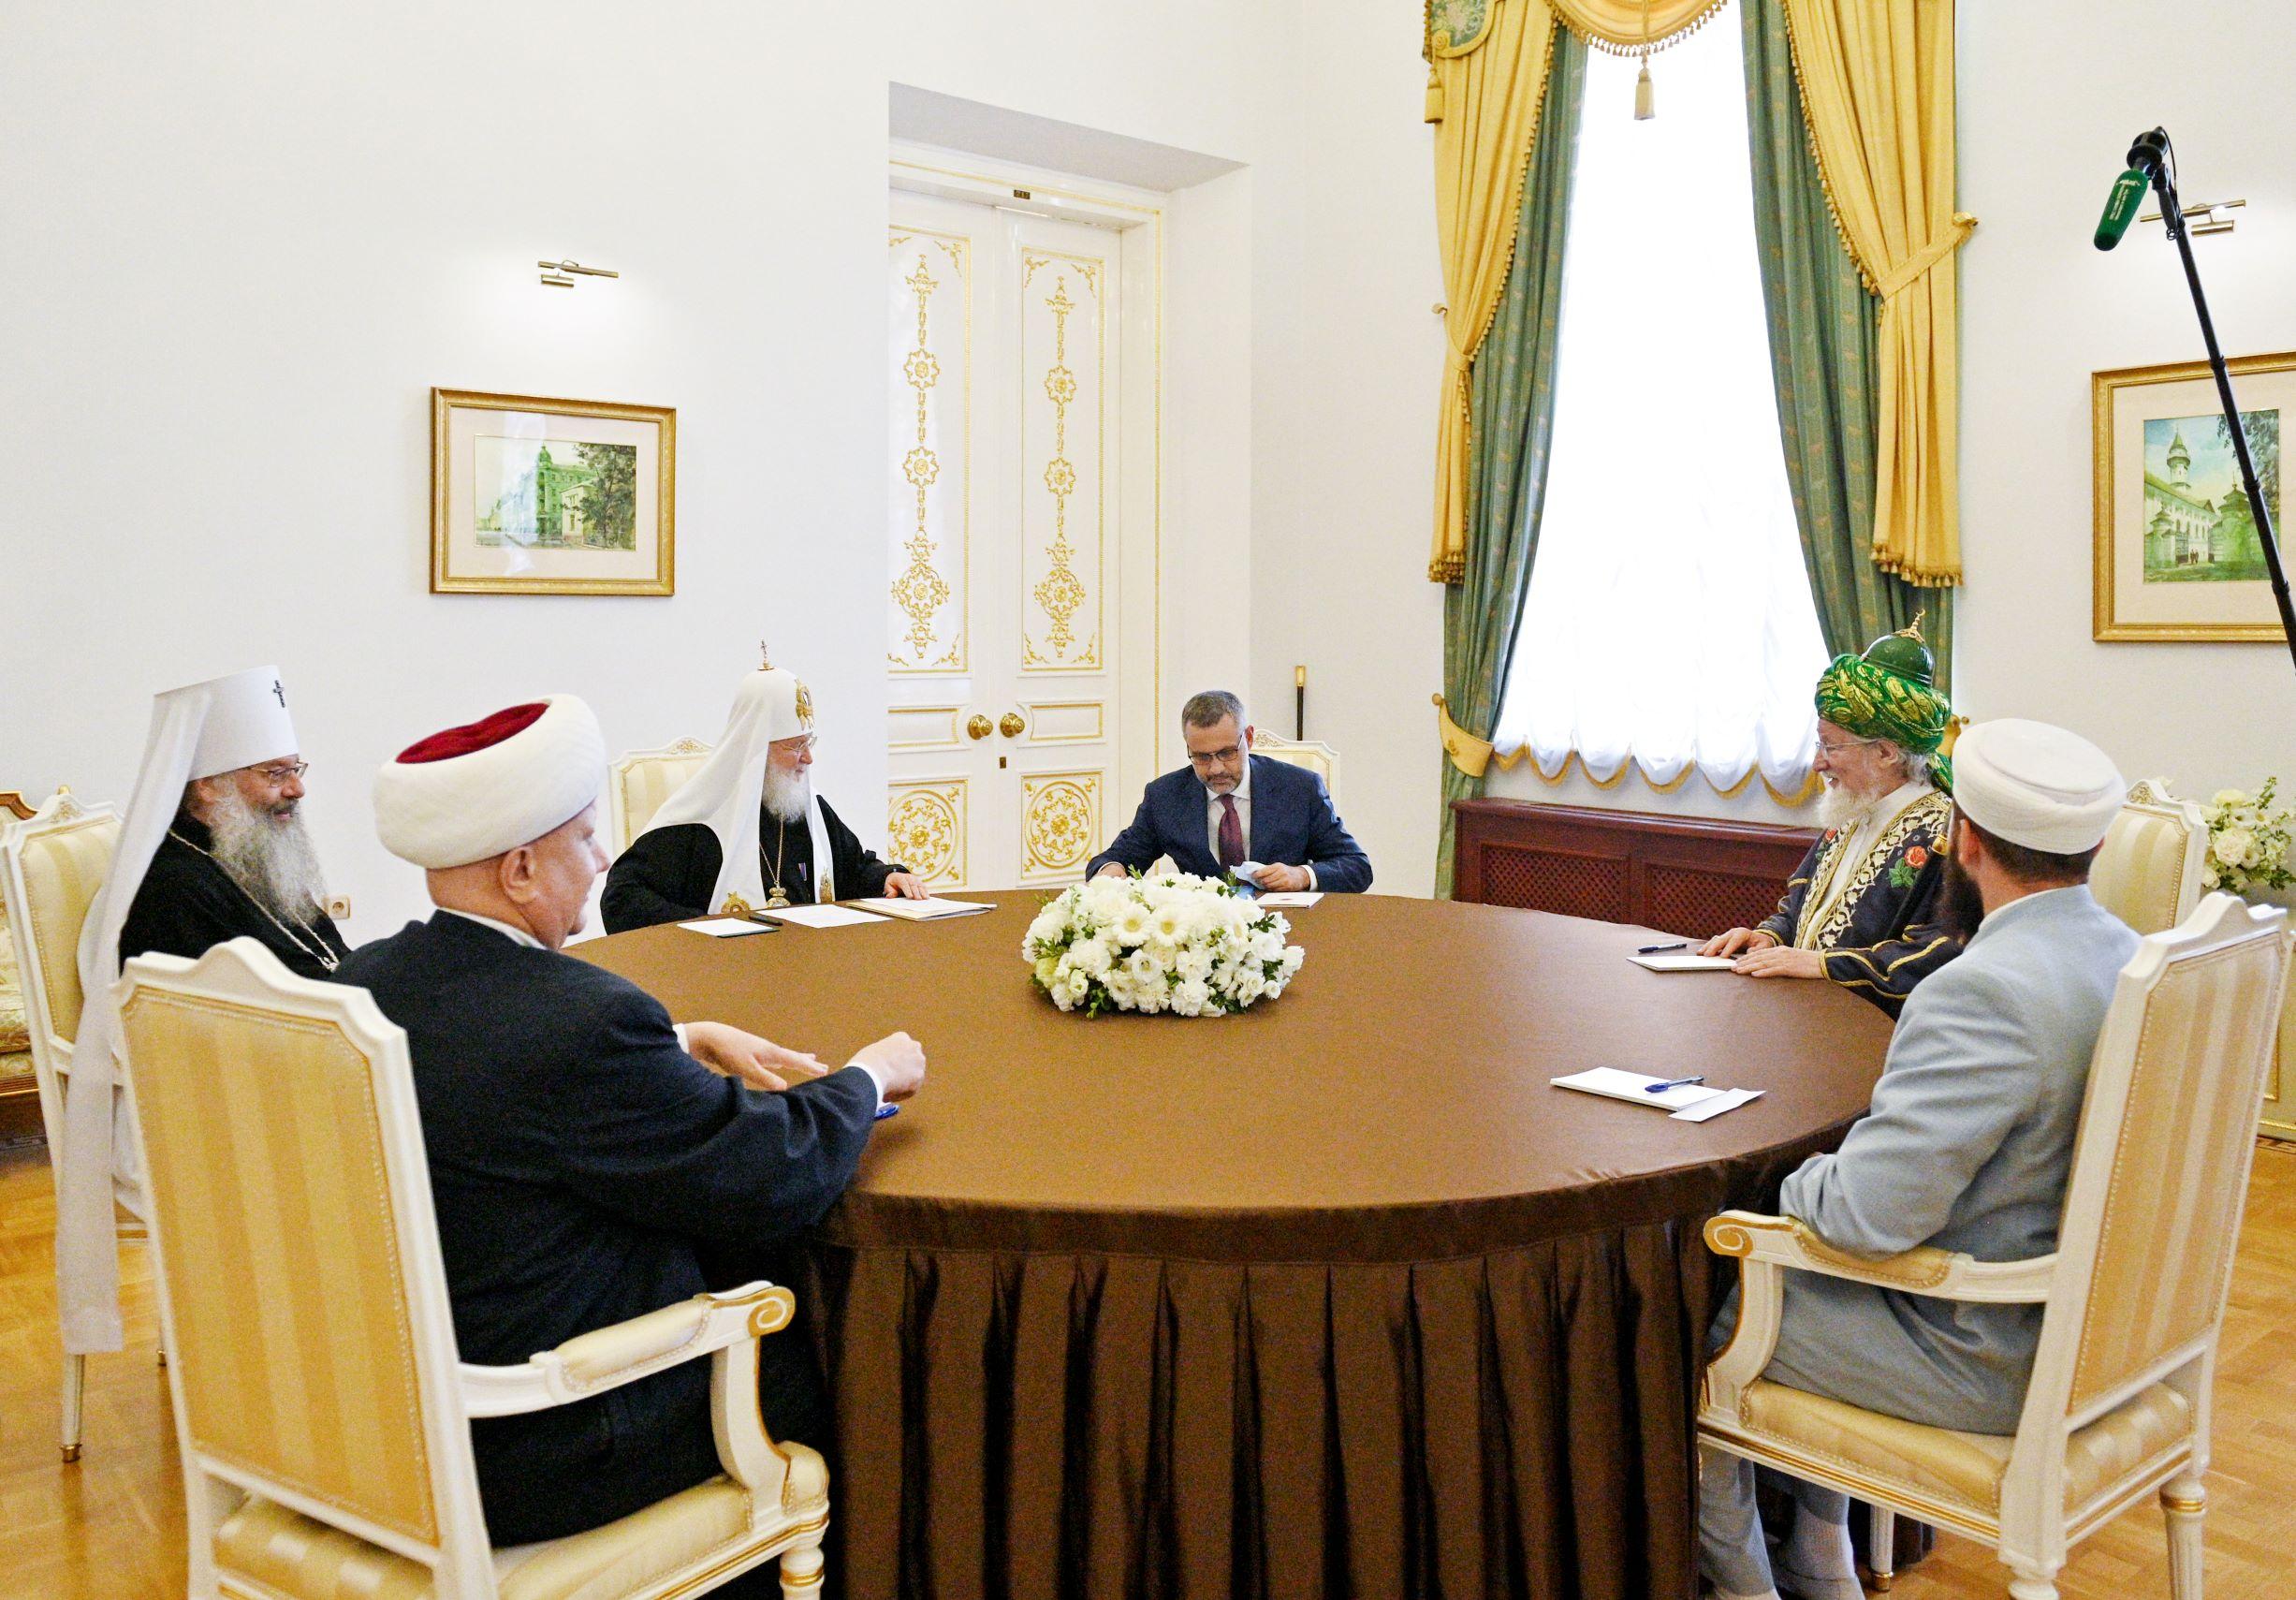 В Казани Патриарх Кирилл встретился с мусульманскими лидерами